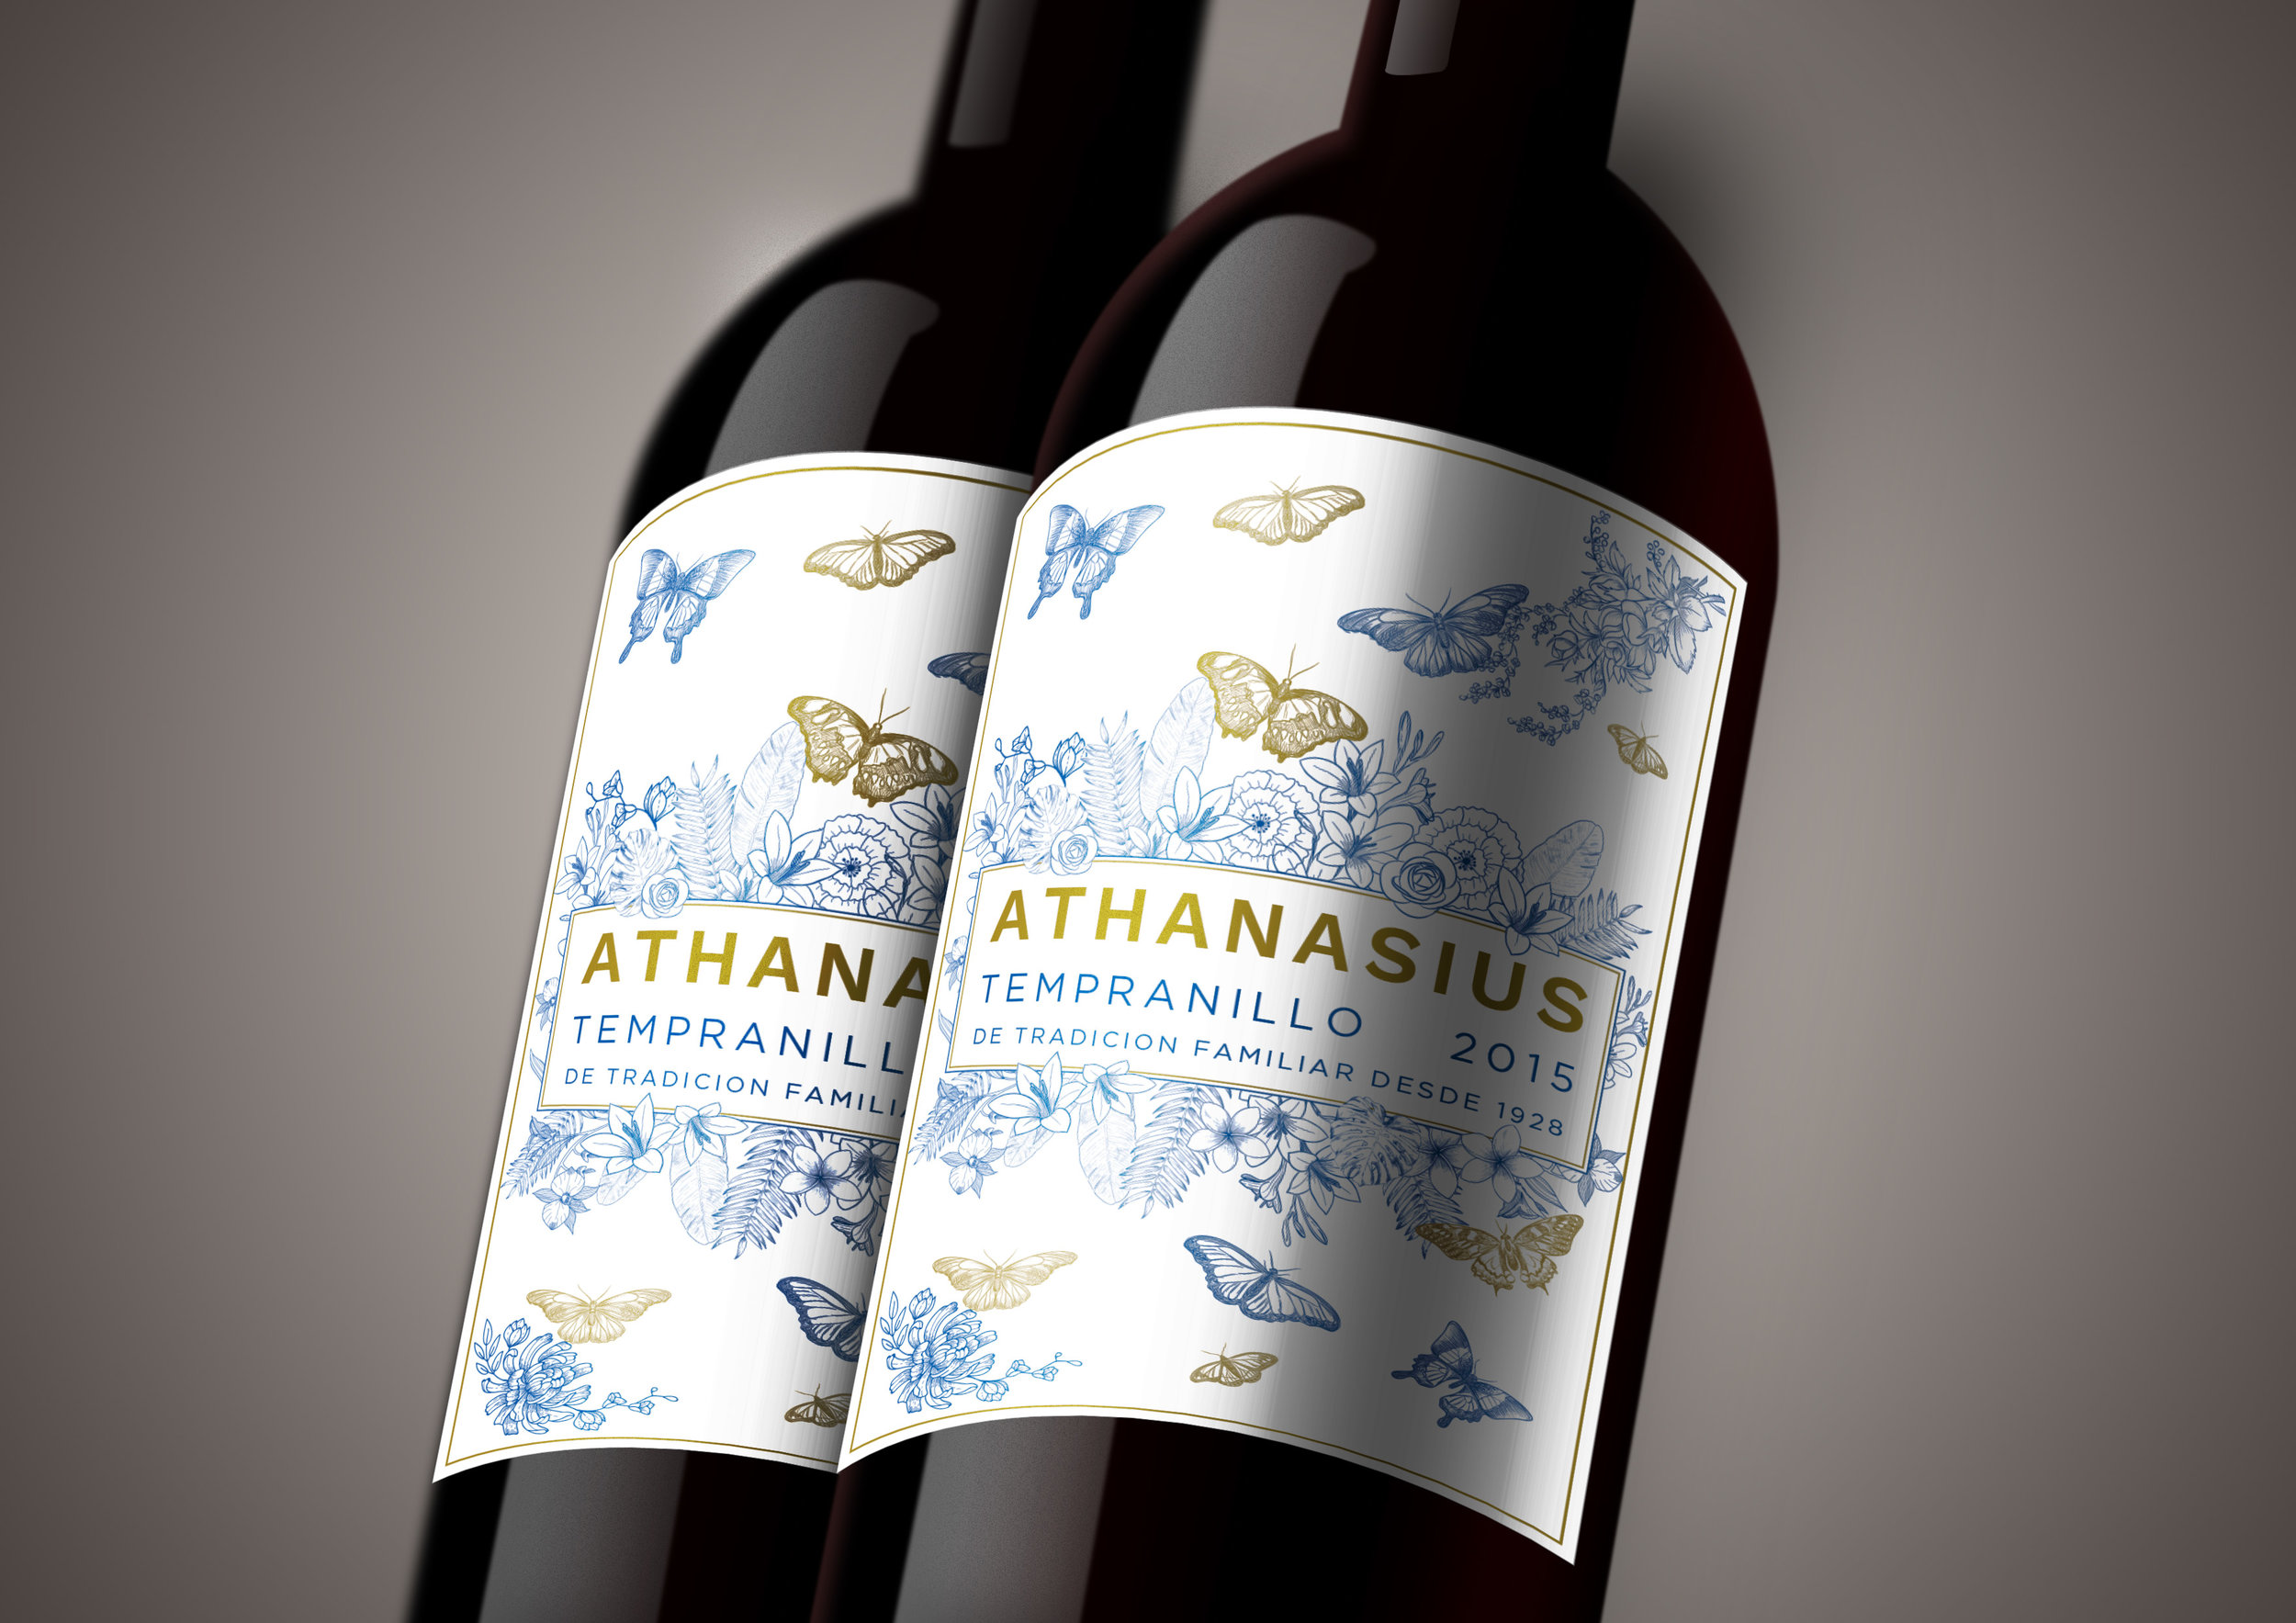 Athanasius 2 Bottle Shot Mock Up.jpg